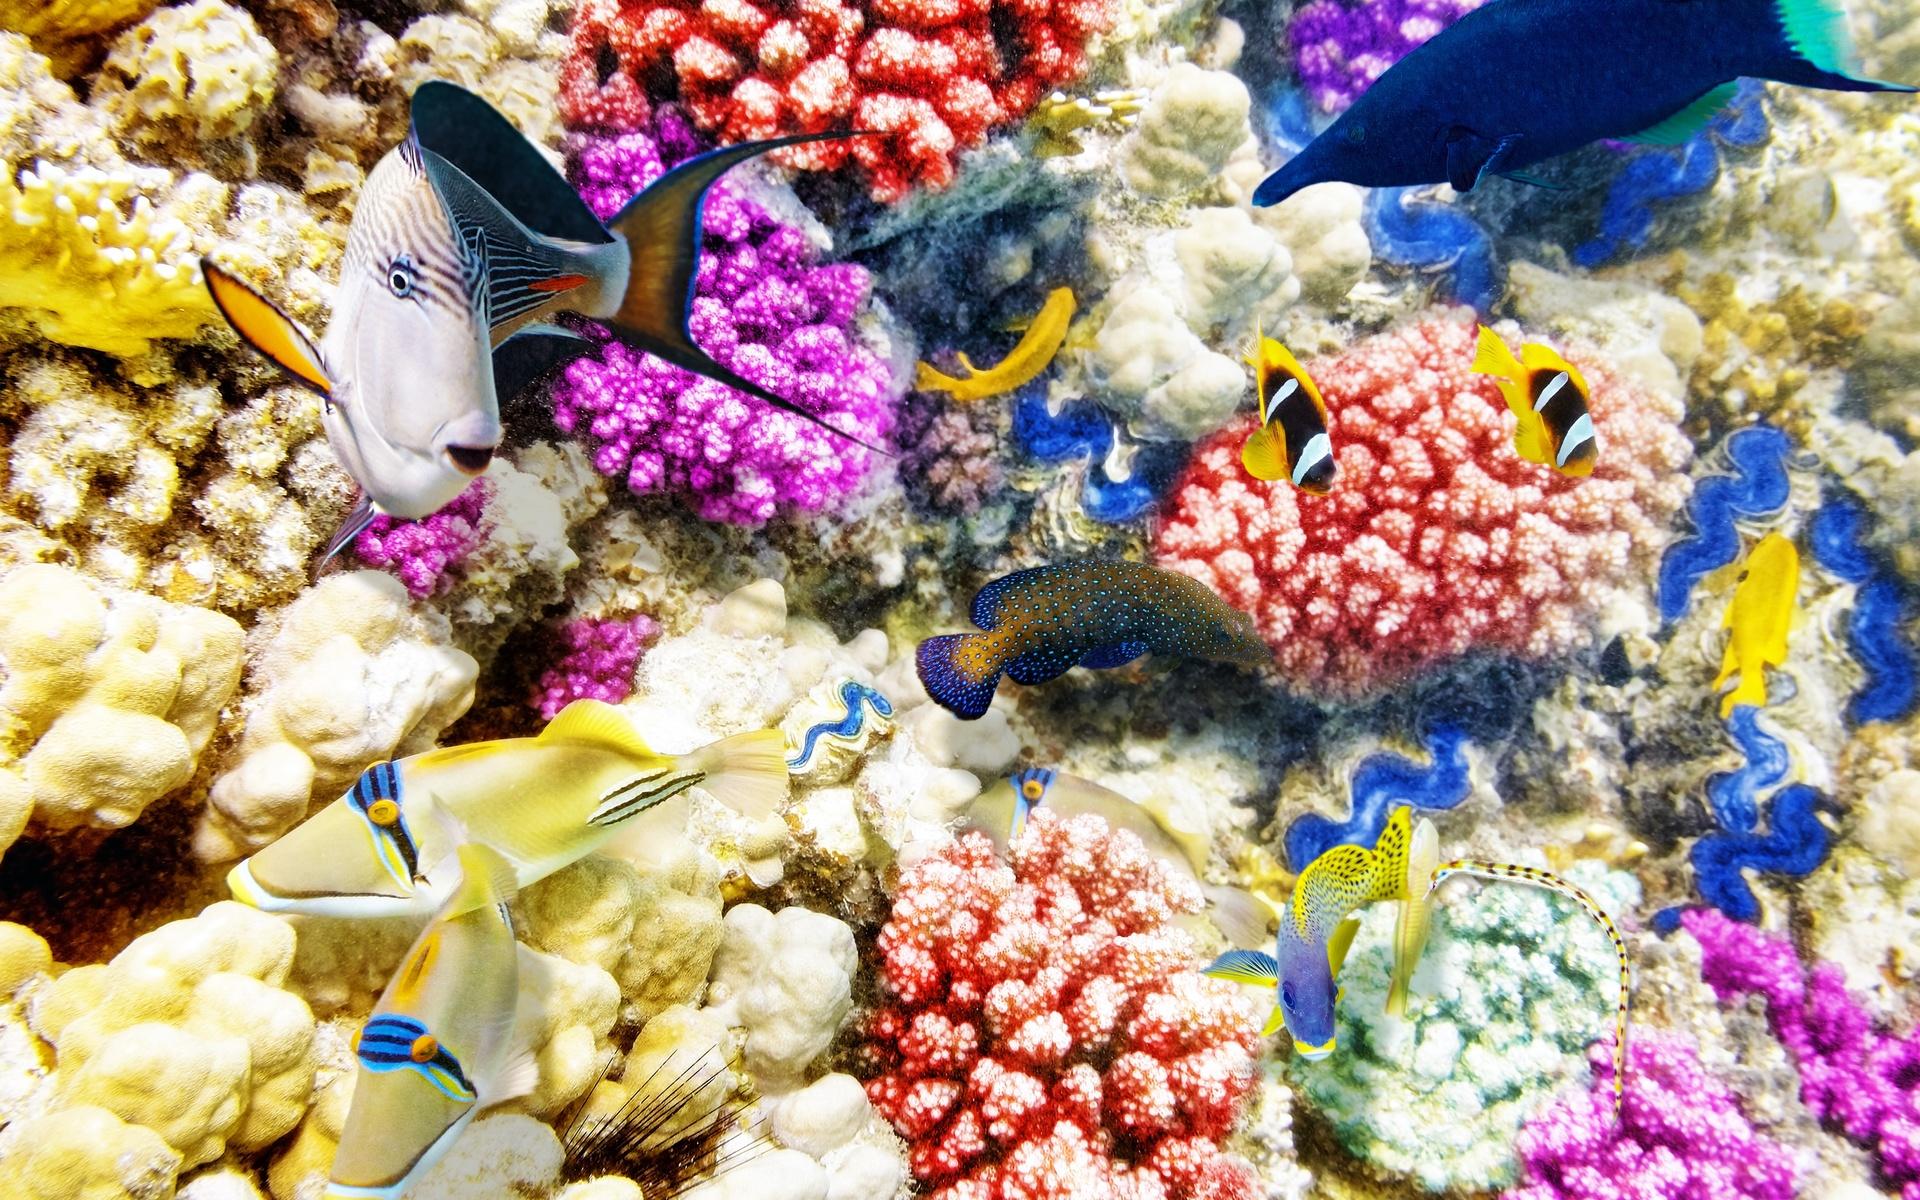 садовая картинки с морскими видами обойтись фиксами